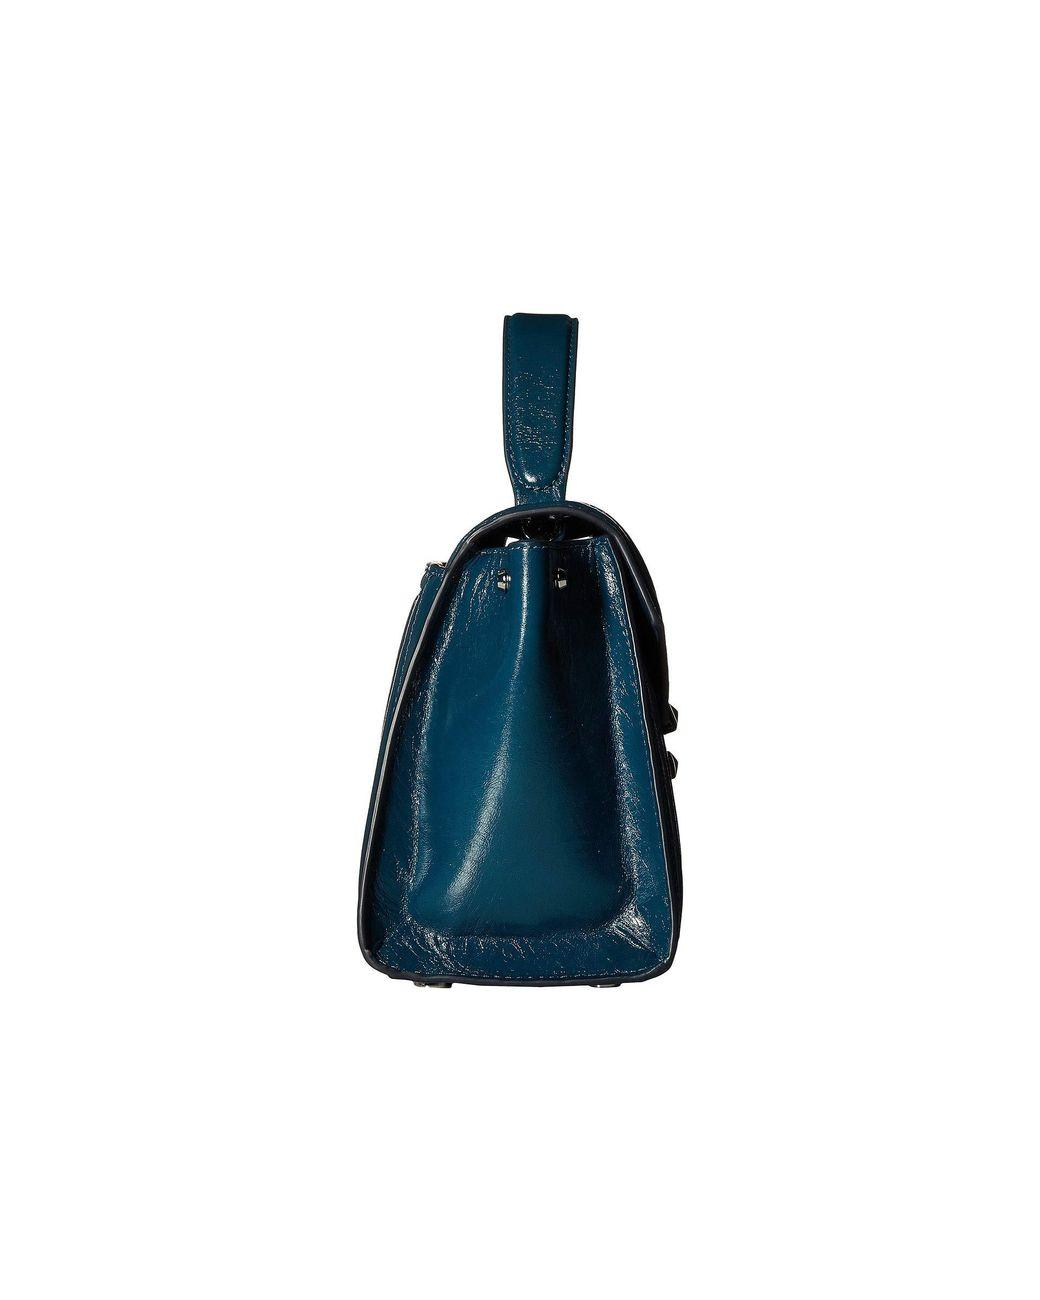 7bce58e3bbd3 Lyst - MICHAEL Michael Kors Whitney Medium Top-handle Satchel in Blue -  Save 36%